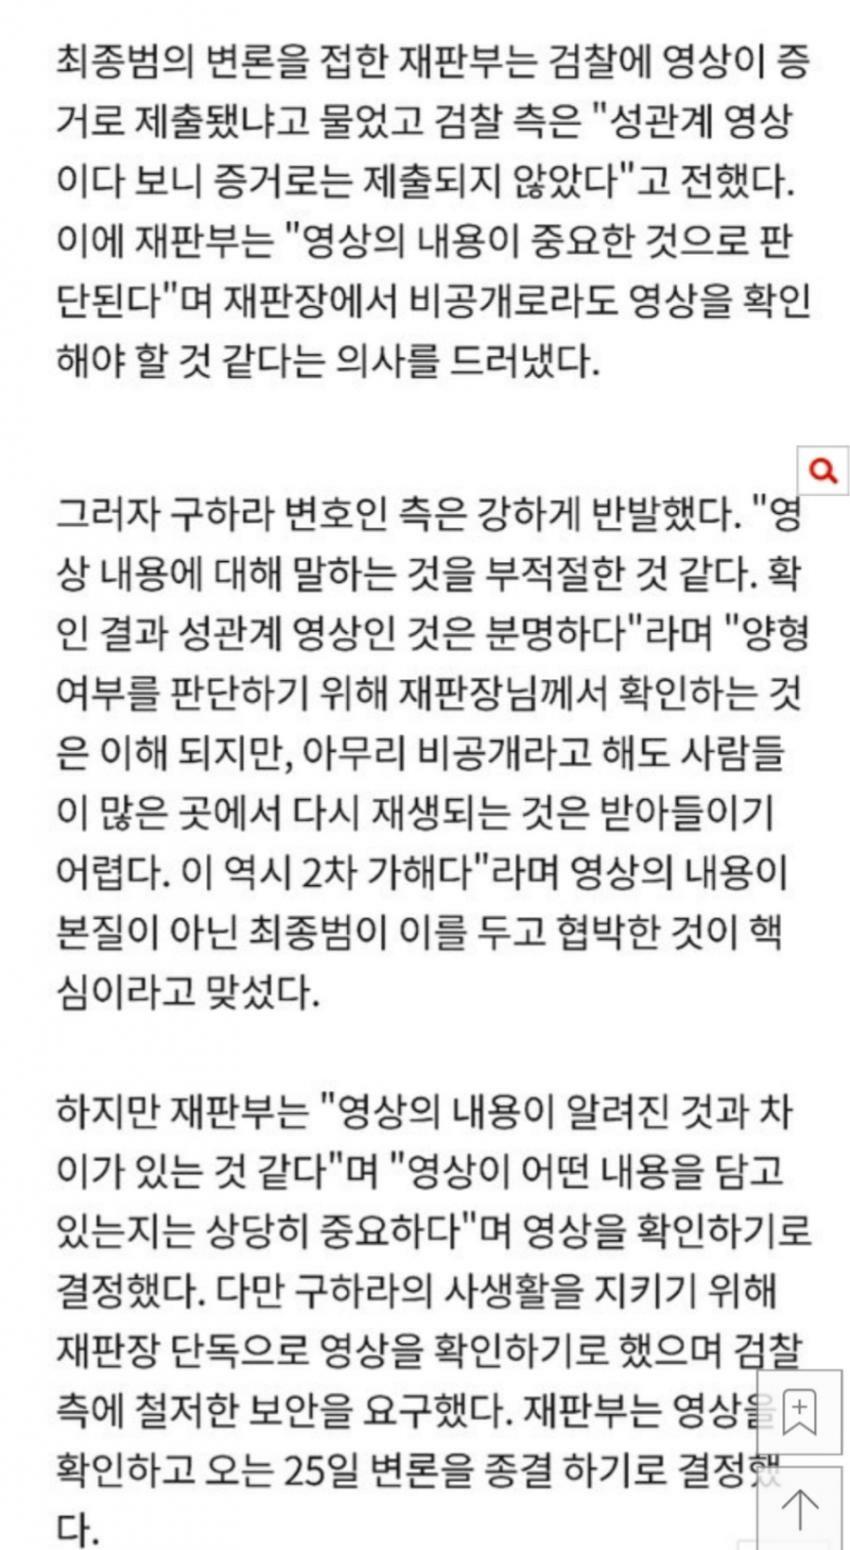 1563600166.jpg 구하라 성관계 동영상 원본 요구하는 판사....jpg